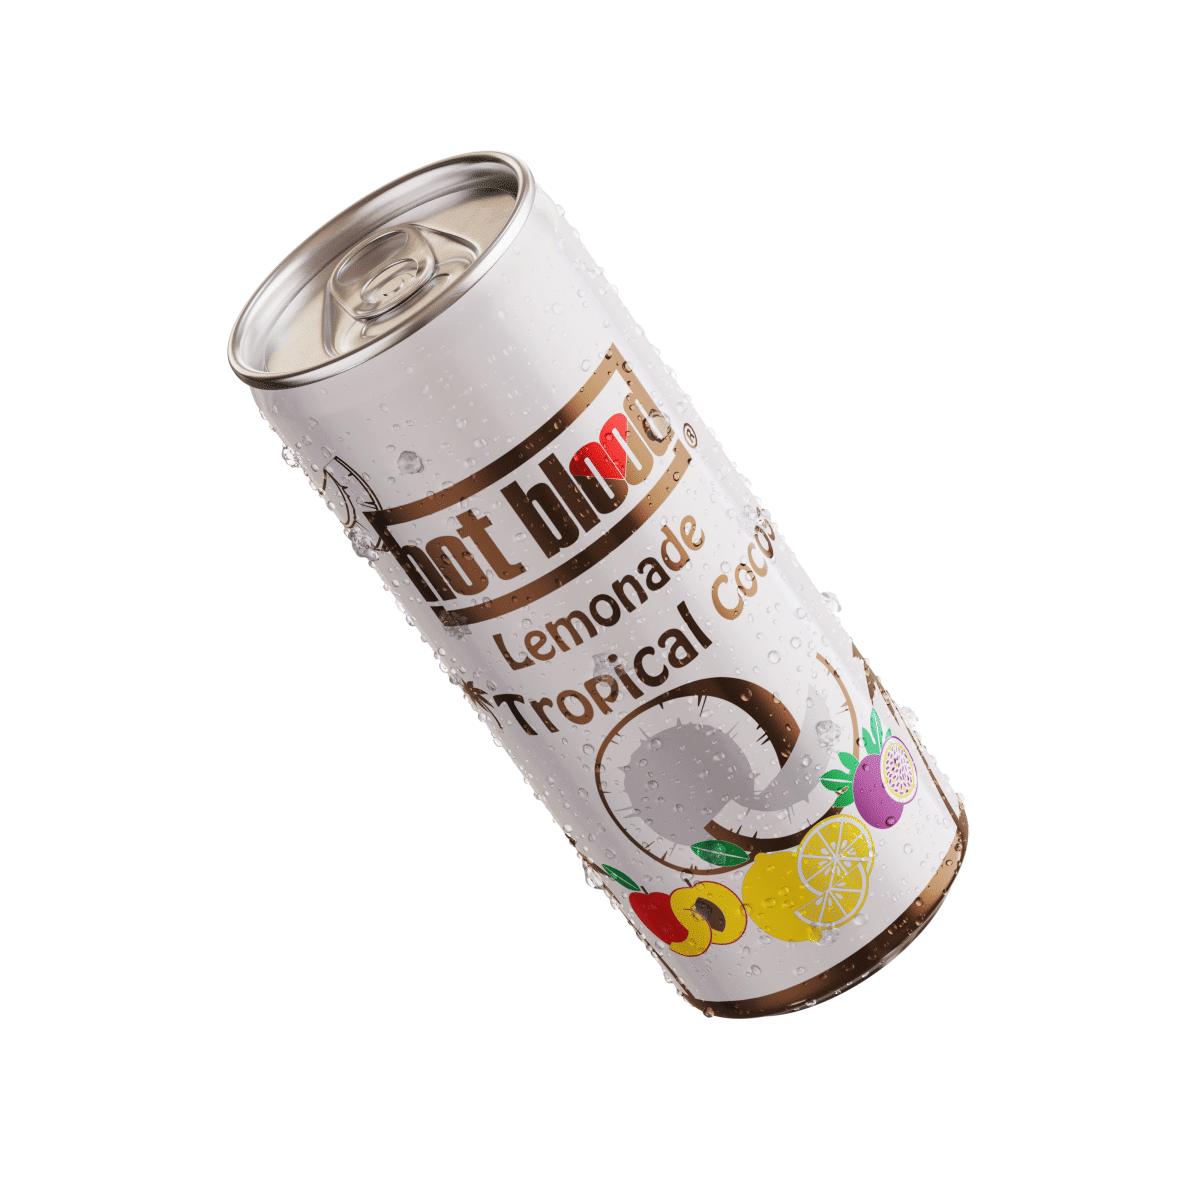 24 x Hot Blood Lemonade Tropical Cocos 330ml